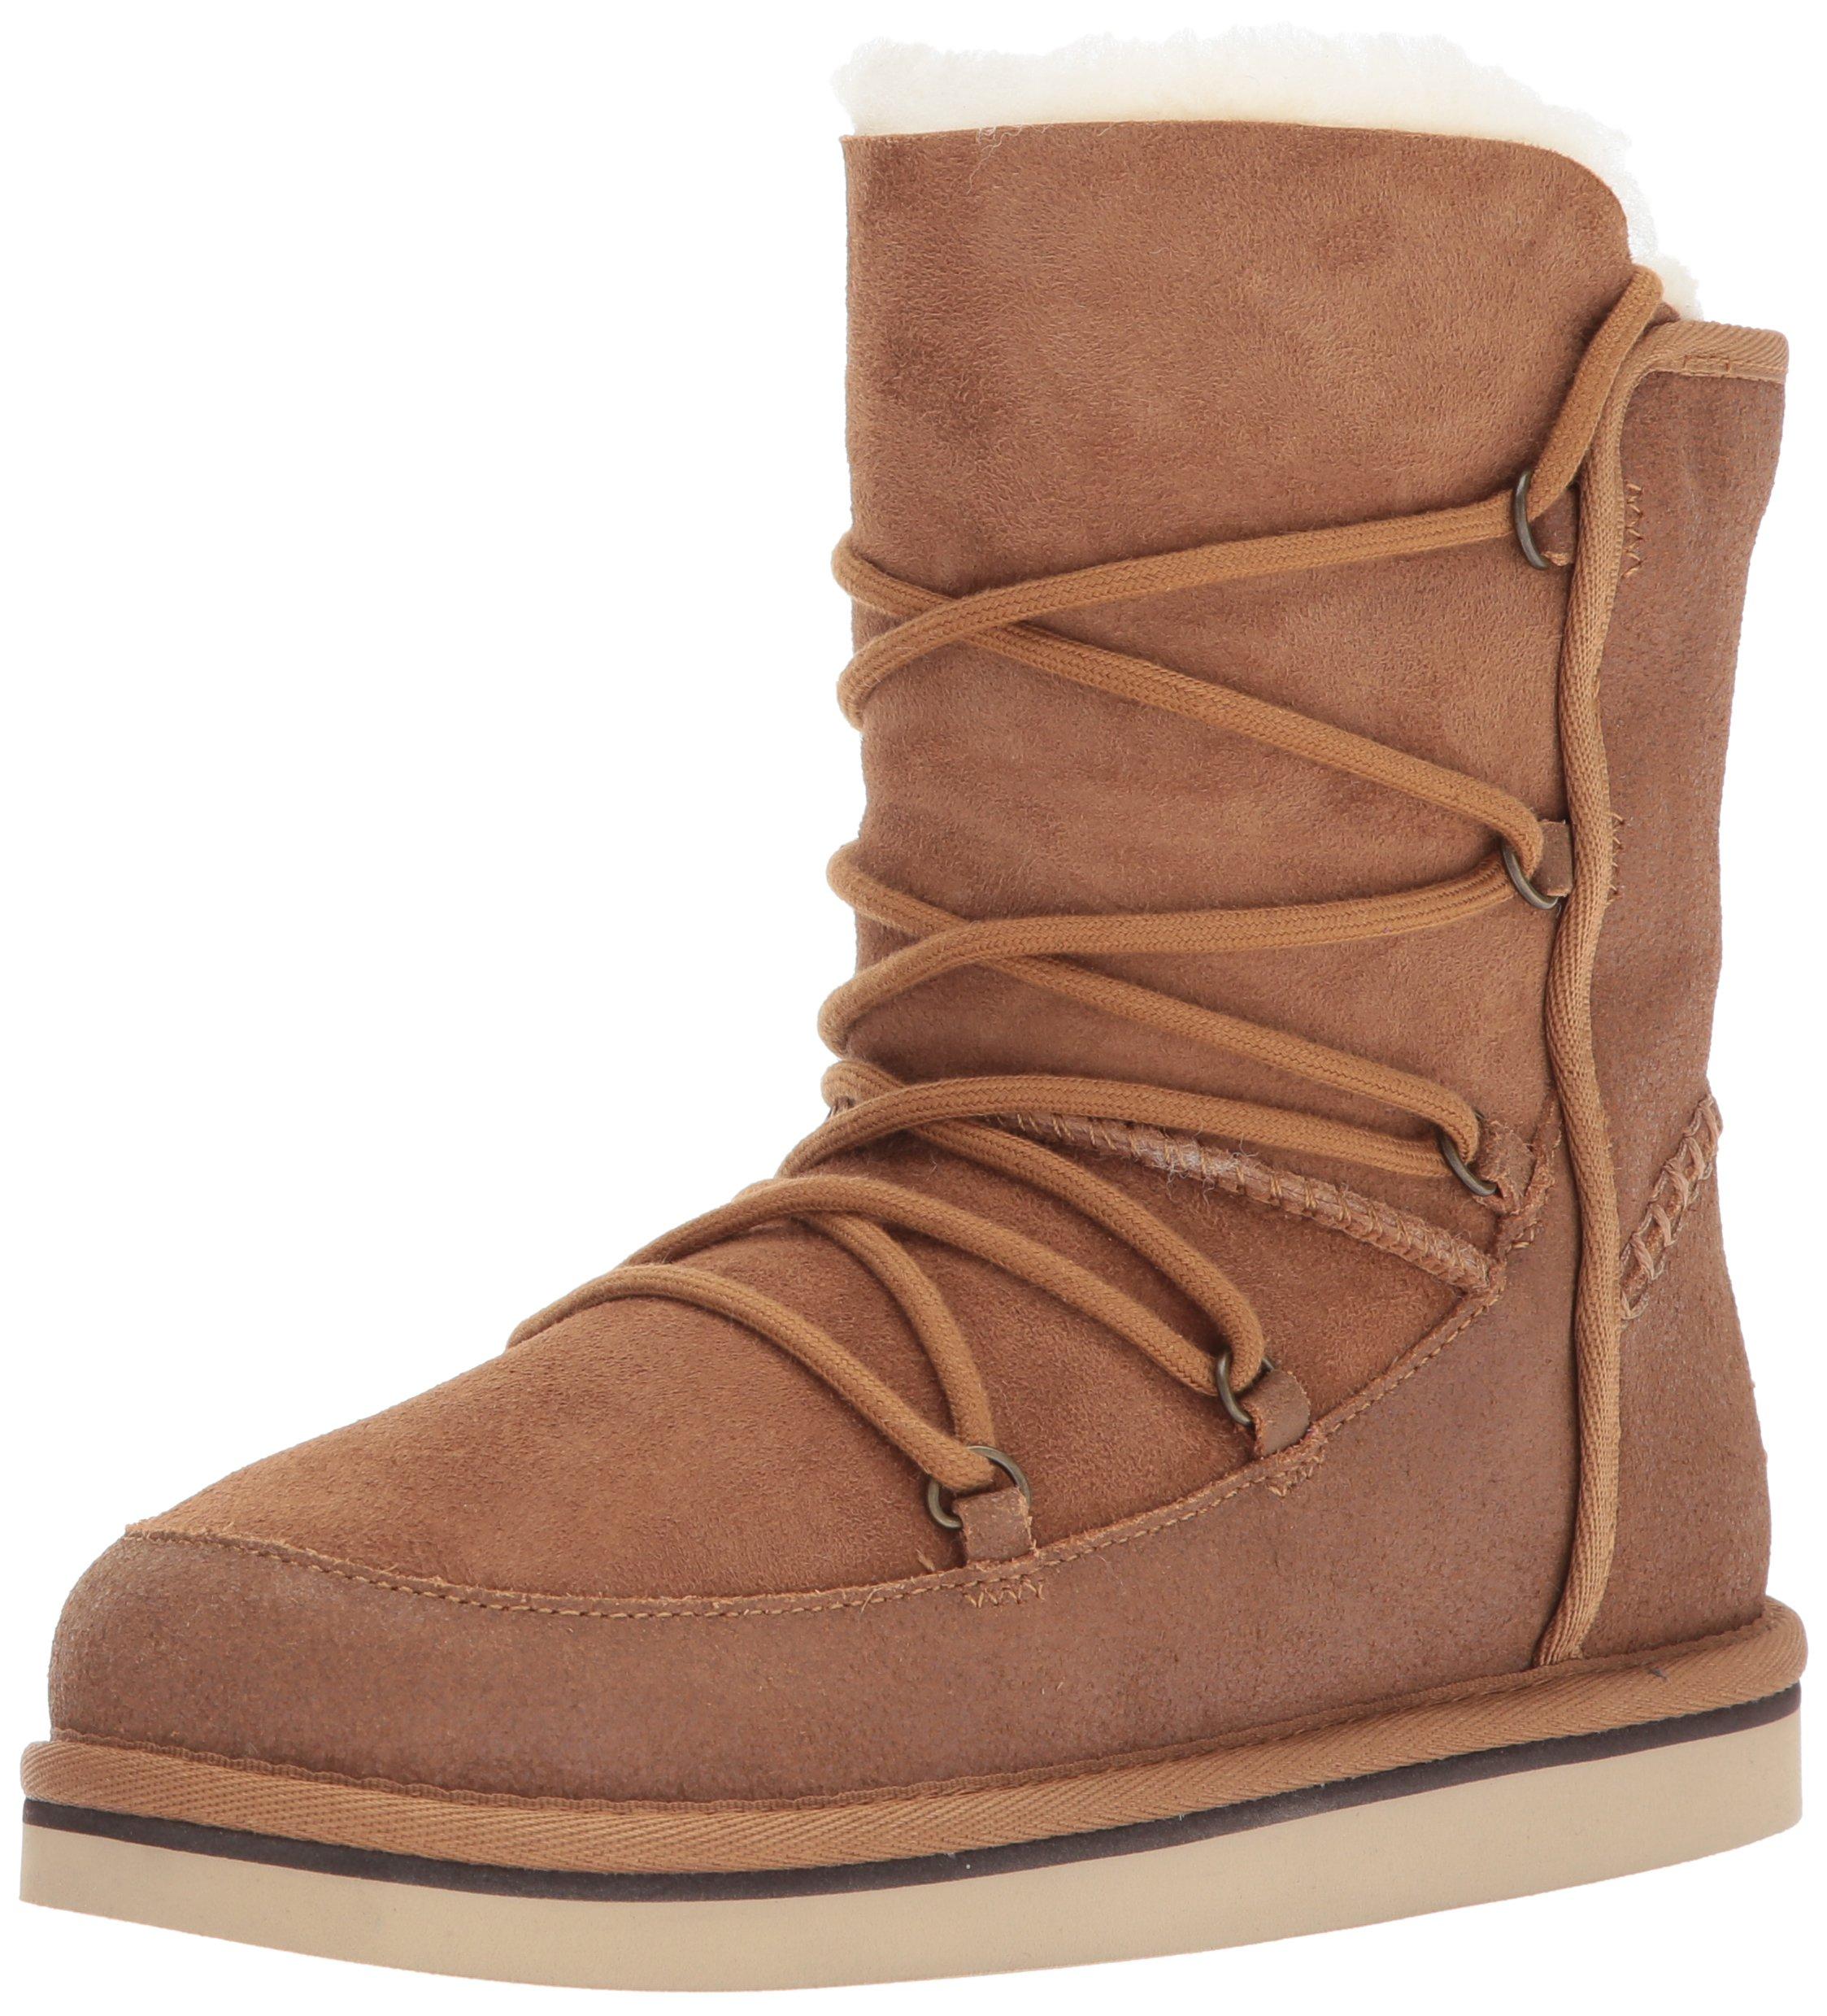 UGG Kids K Eliss Pull-On Boot, Chestnut, 13 M US Little Kid